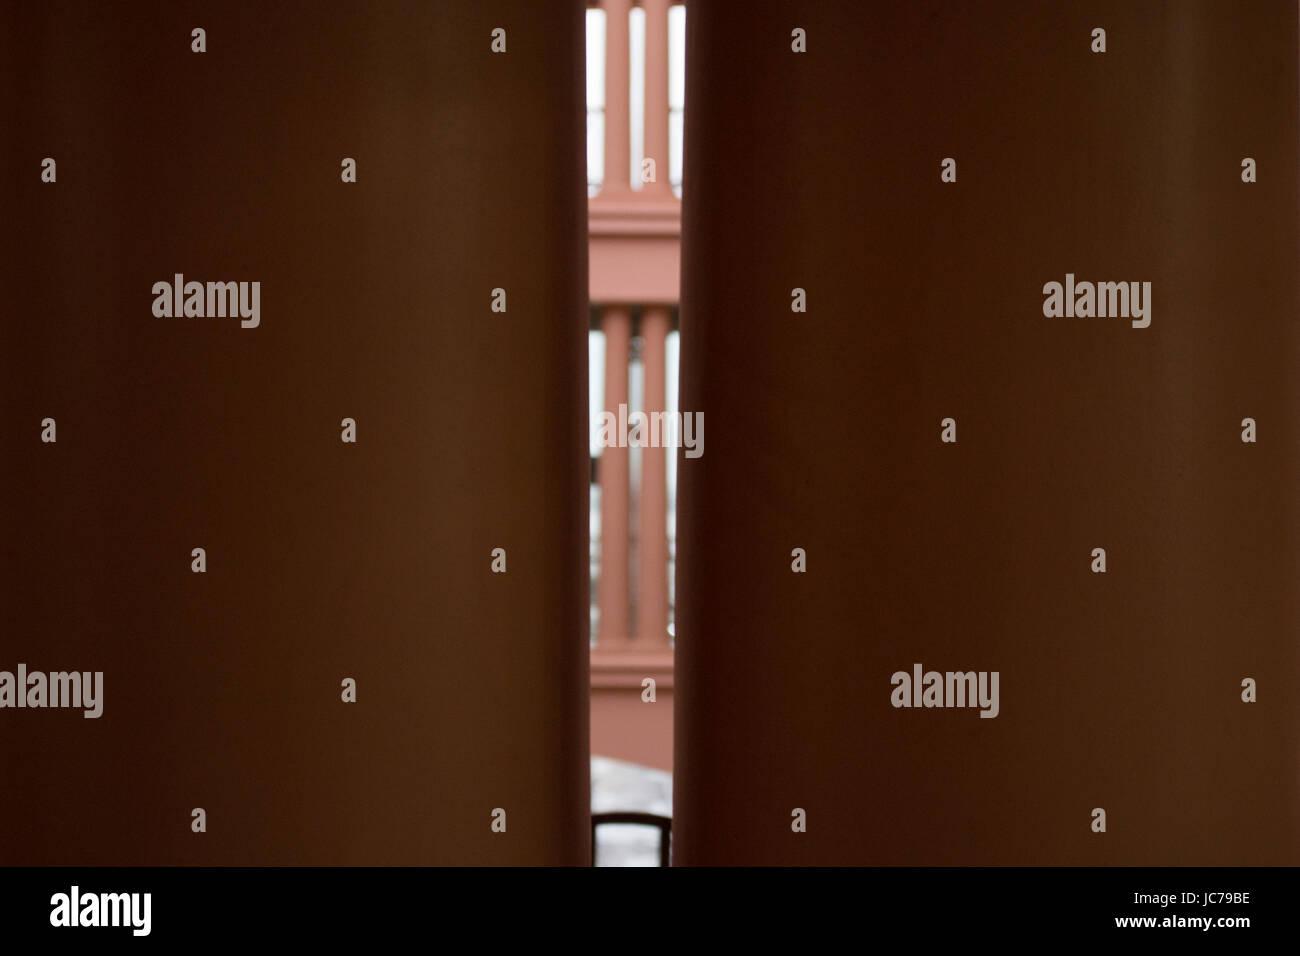 Symmetrical columns - Stock Image